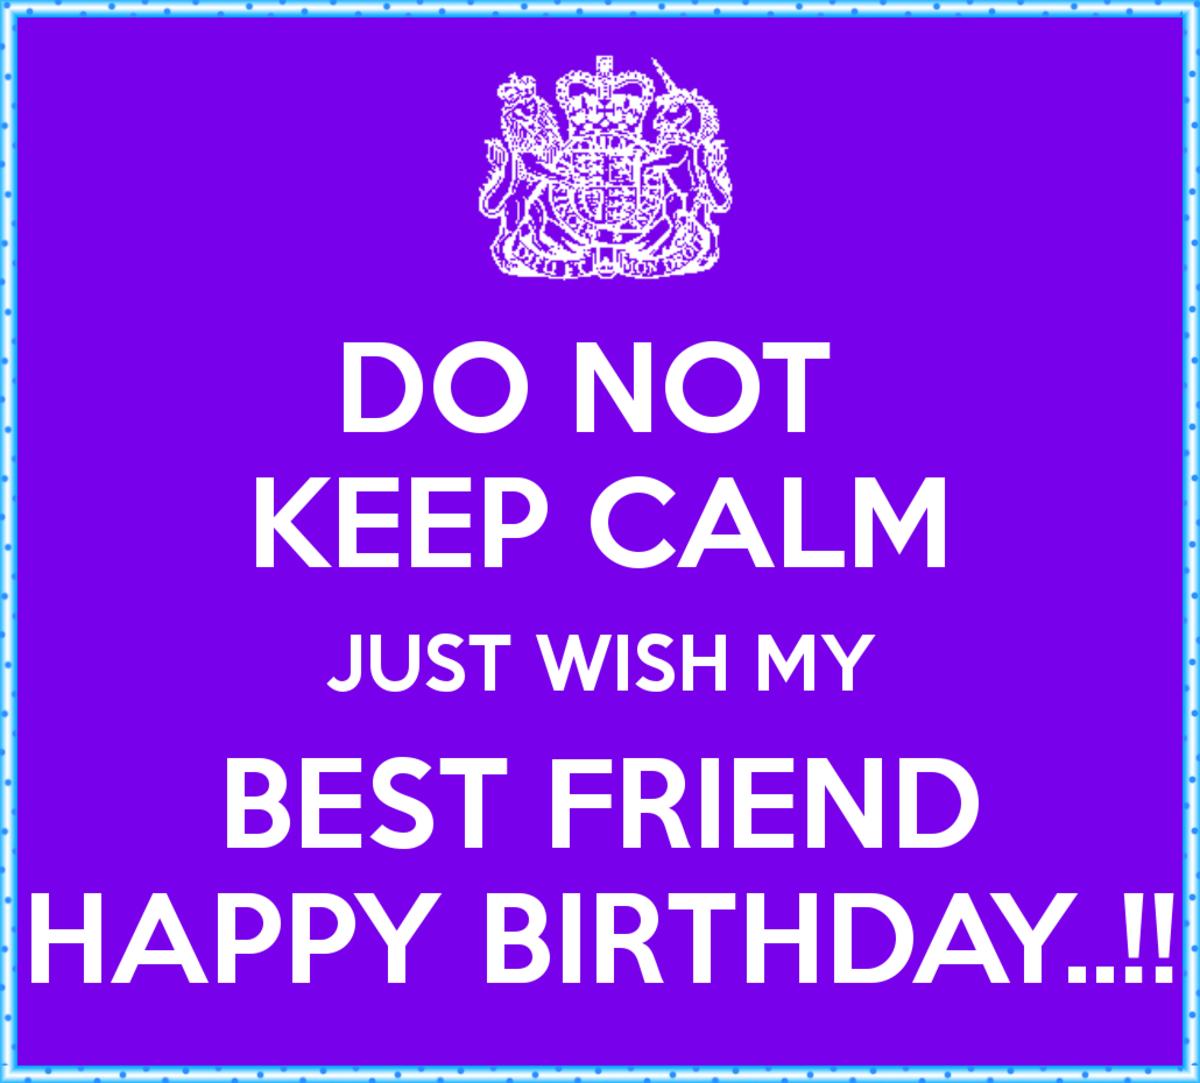 Happy Birthday Letter to My Best Friend